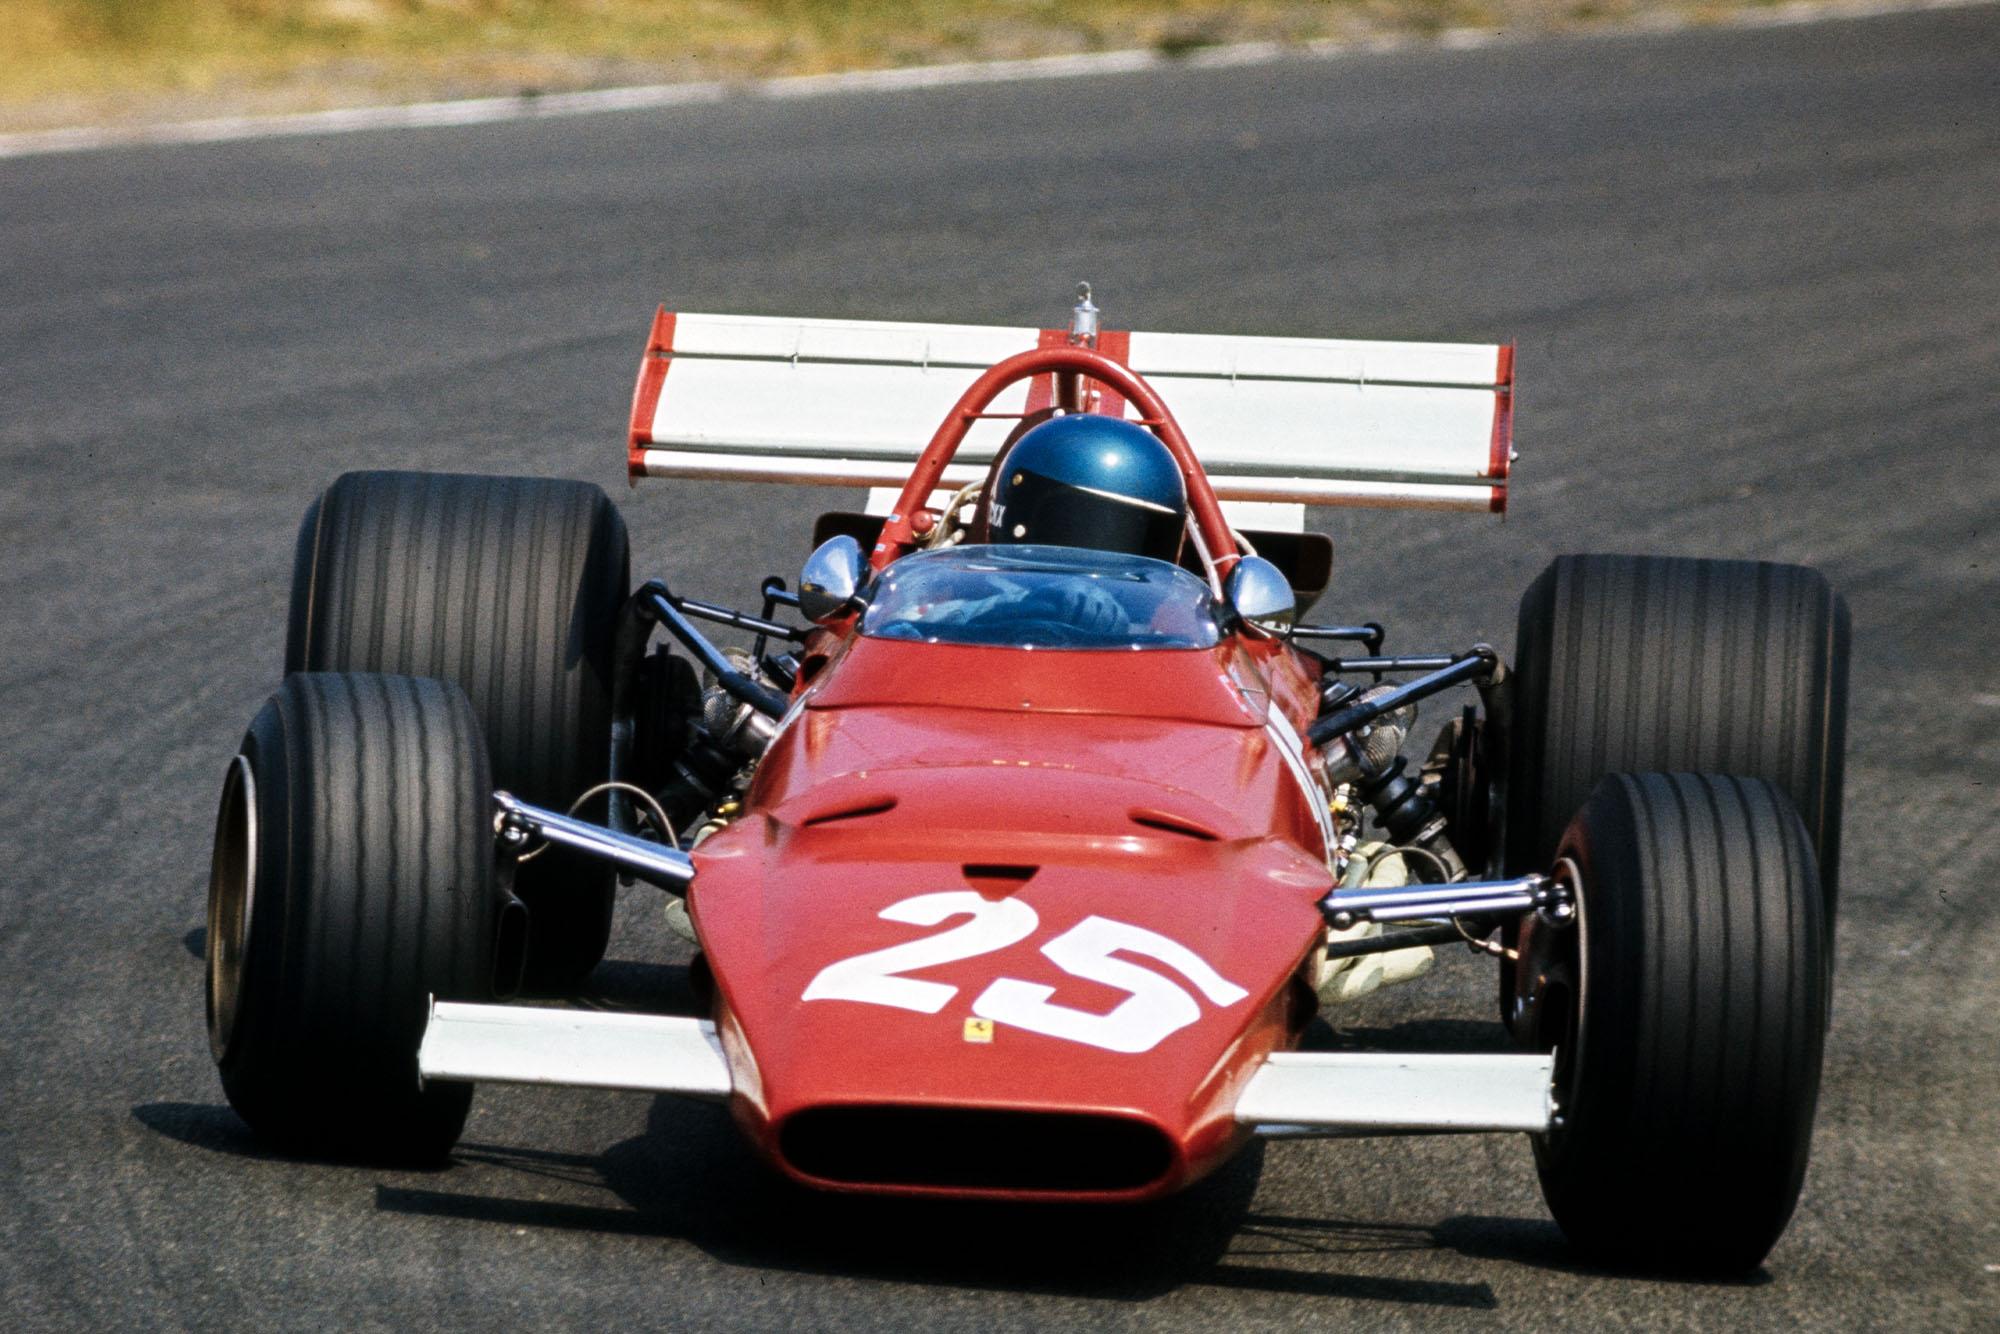 Jacky Ickx in his Ferrari at the 1970 Dutch Grand Prix